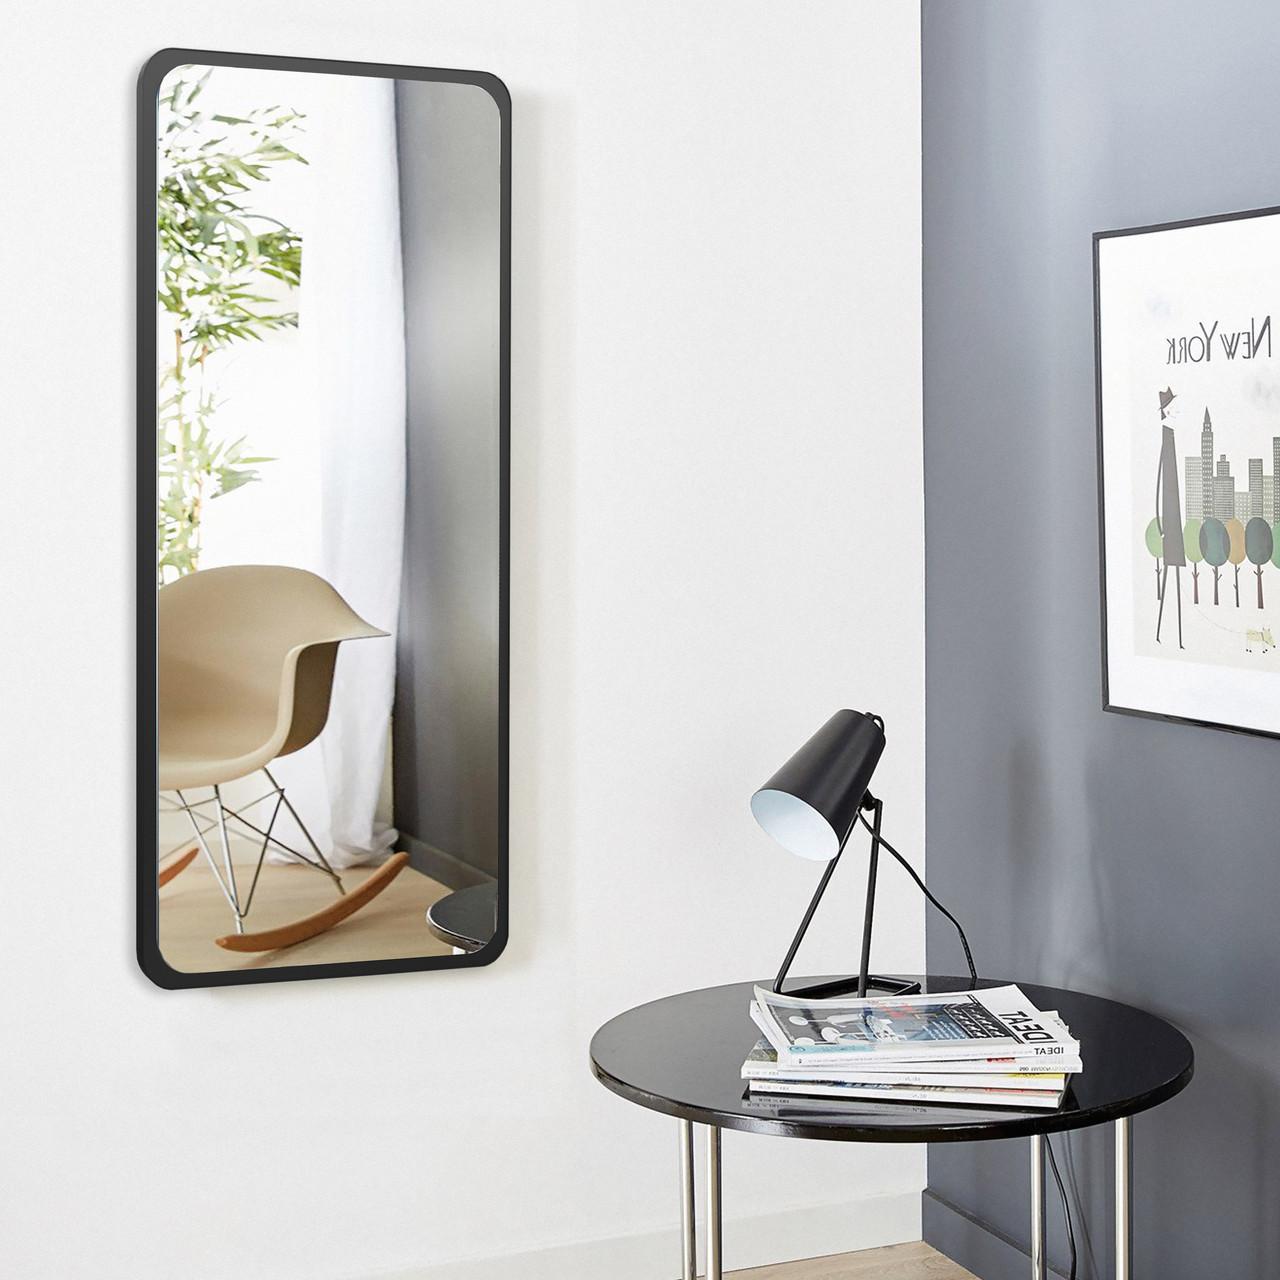 Зеркало ростовое 1300 х 600 мм черное